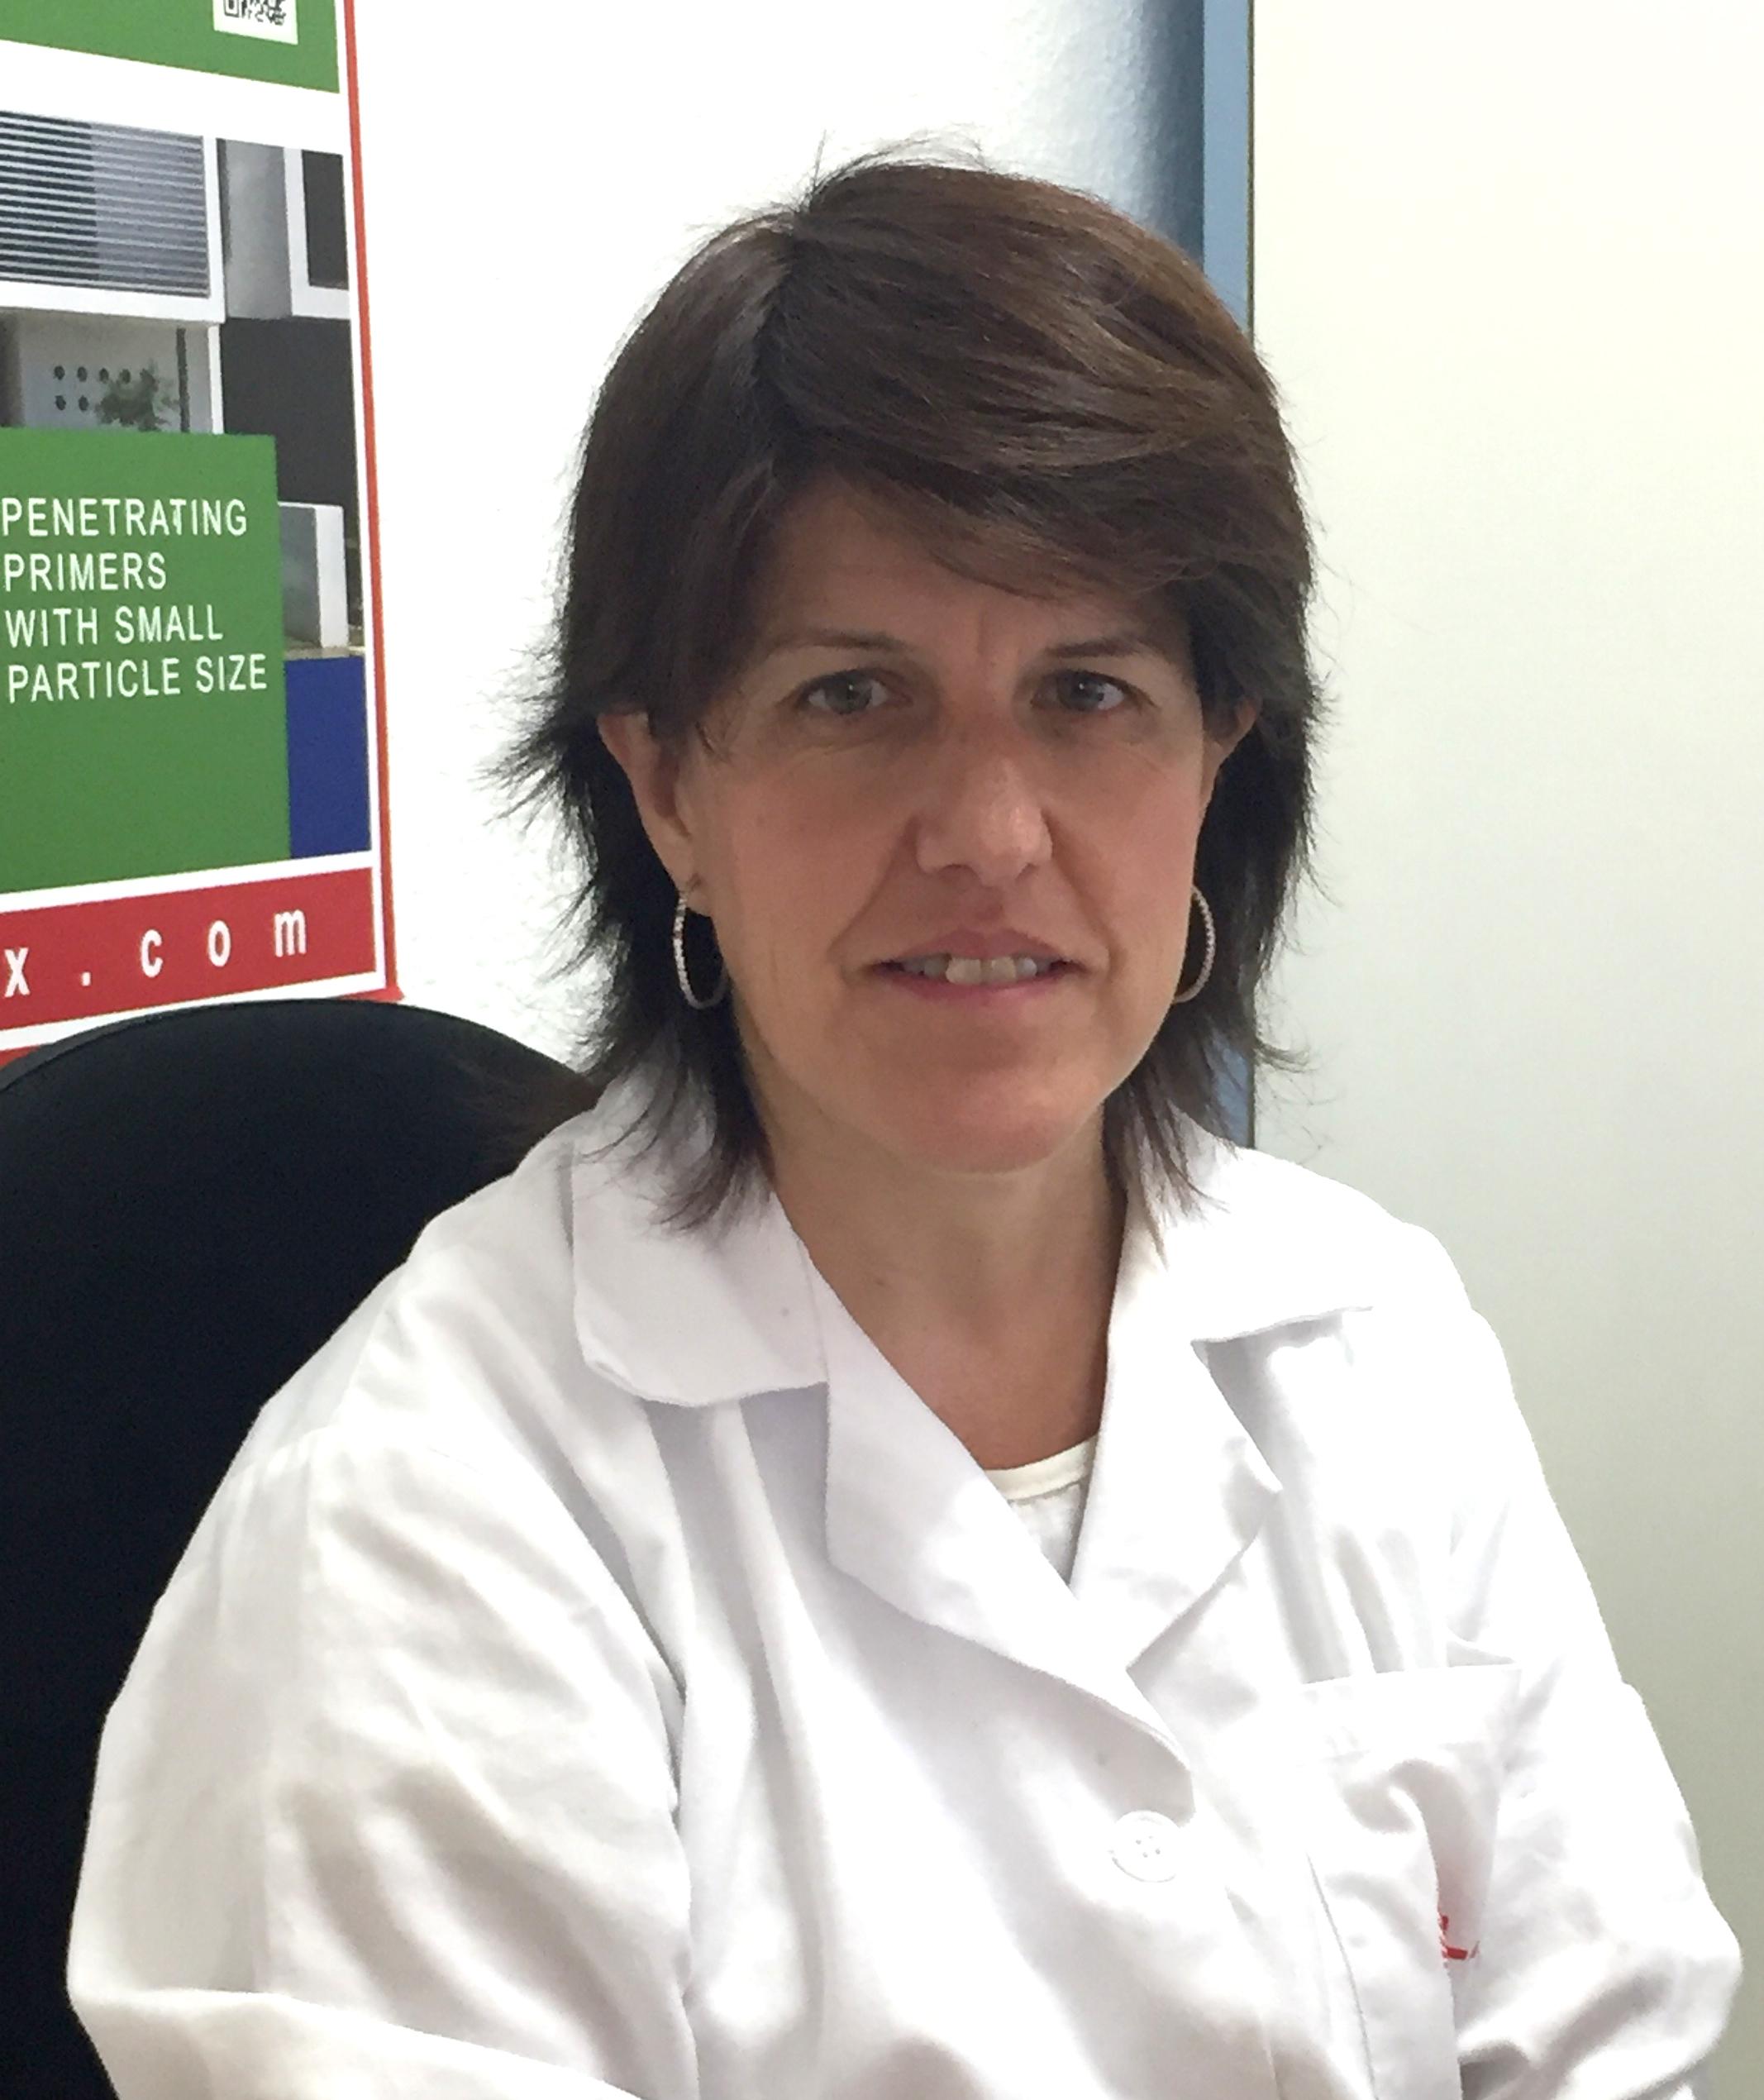 Isabel Turégano Guzmán